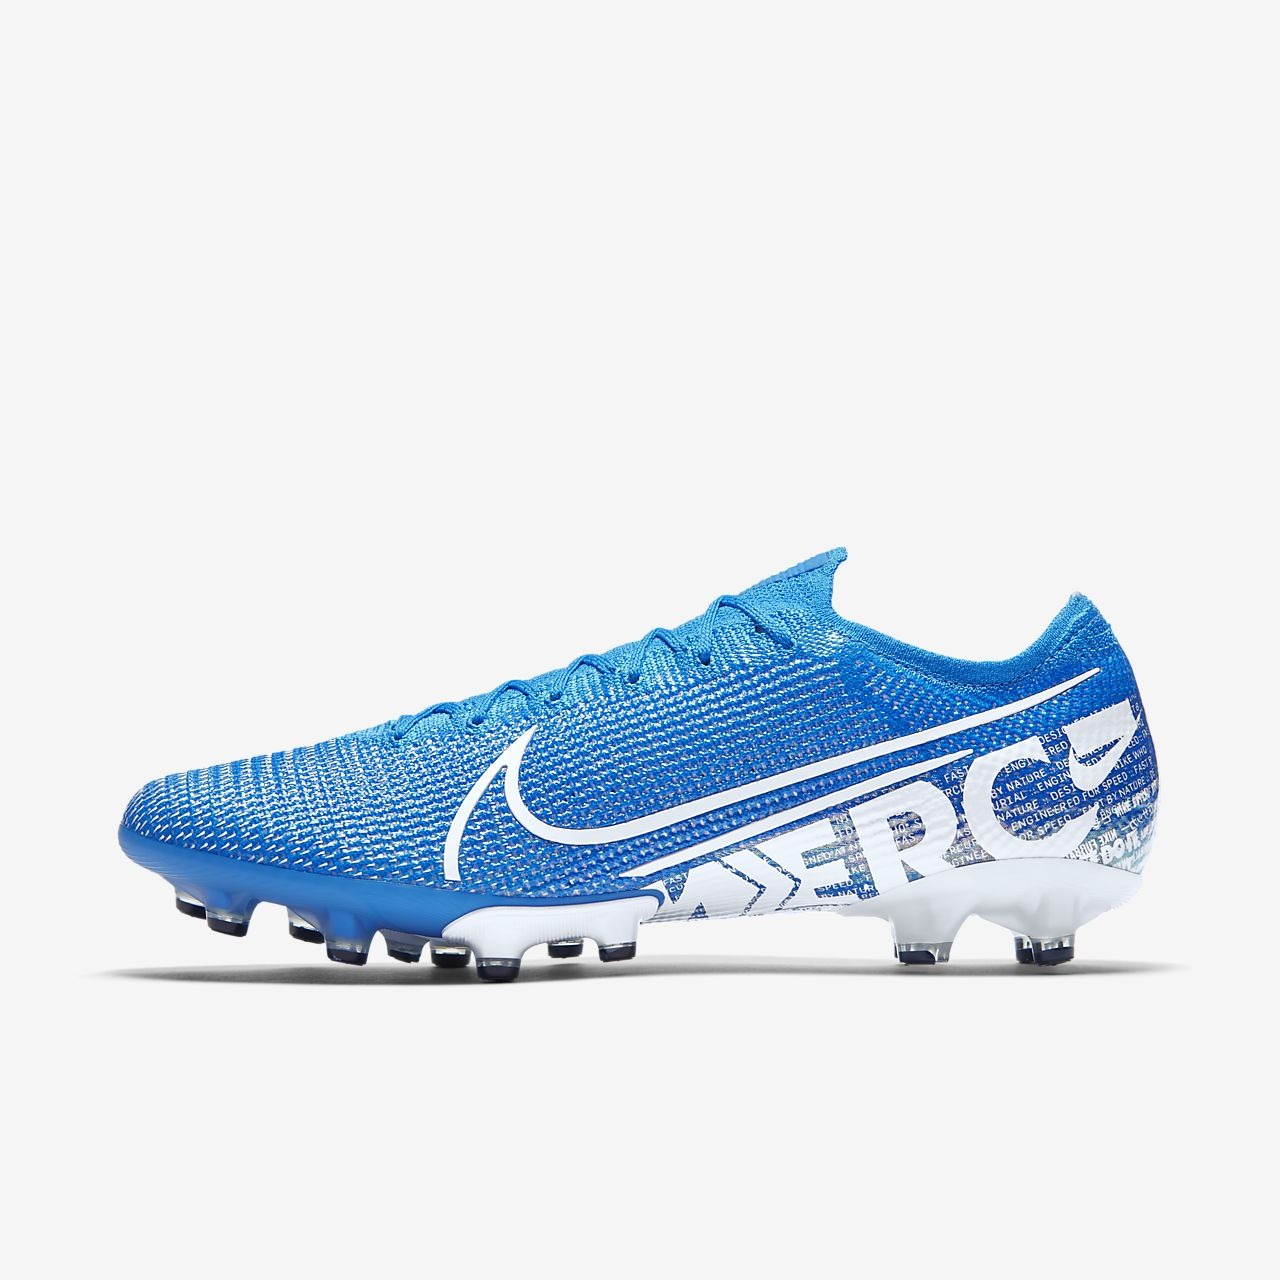 Nike Mercurial Vapor 13 Elite AG-PRO Botas de fútbol para césped artificial